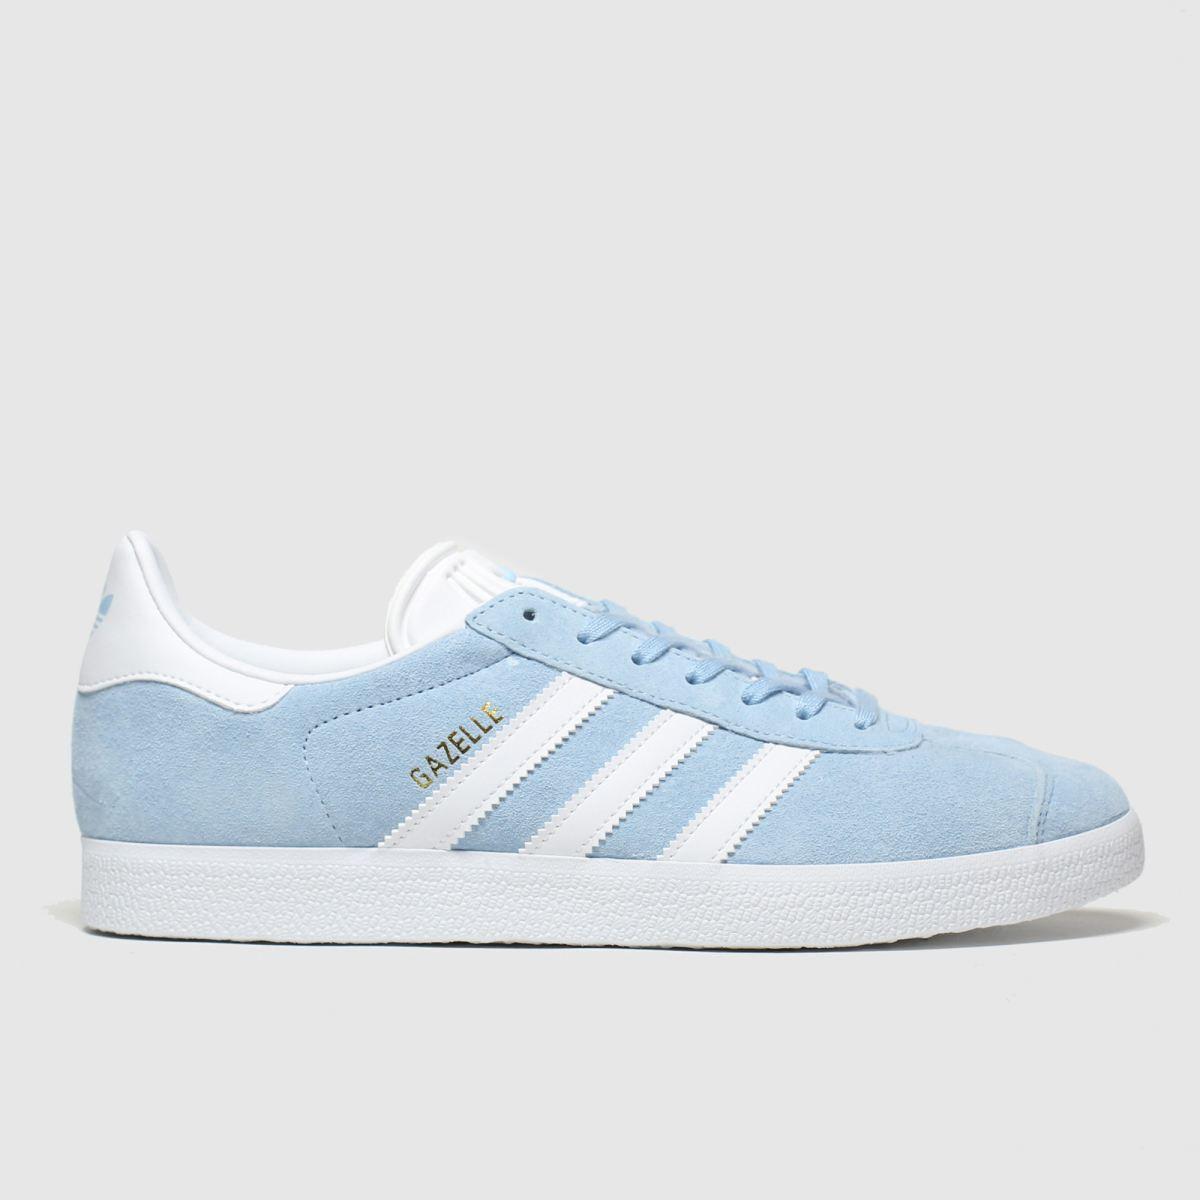 Adidas Pale Blue Gazelle Trainers